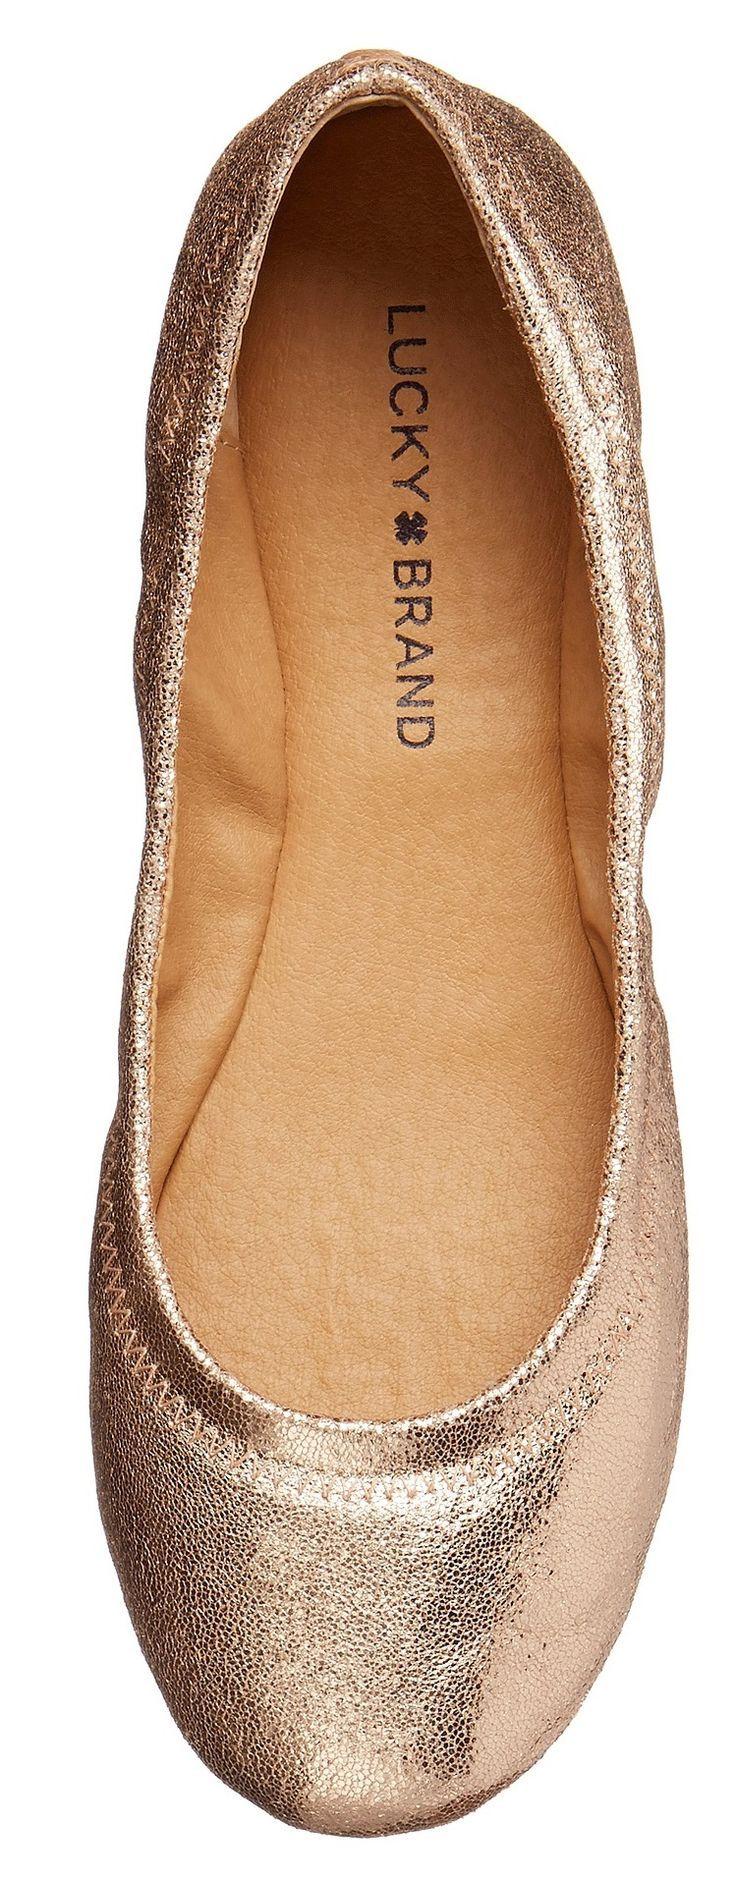 Gold wedding shoes flats